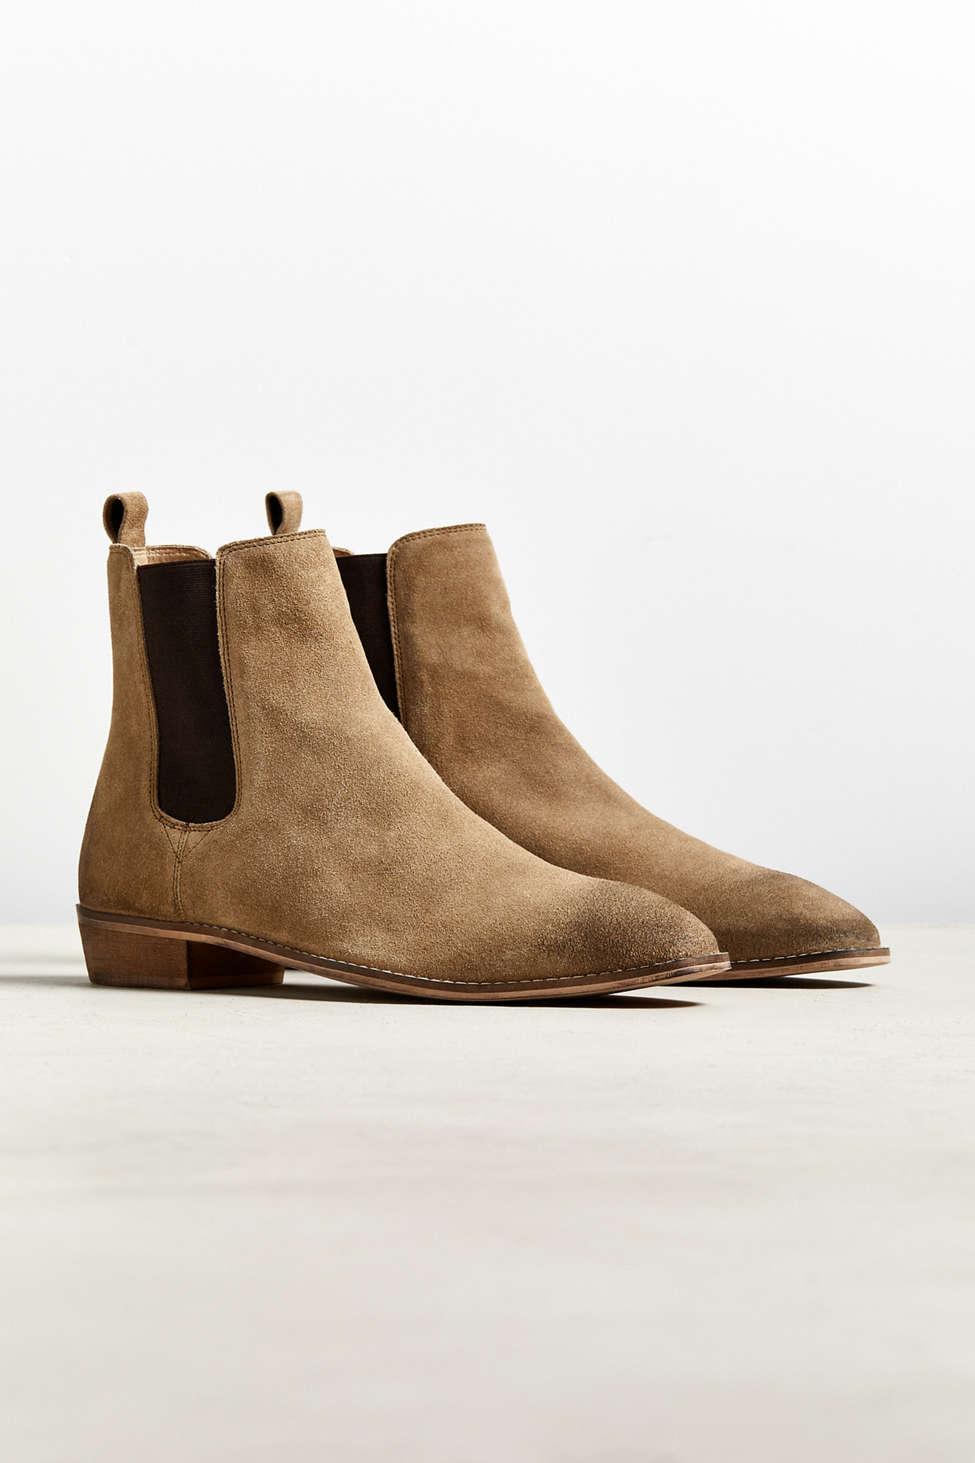 Suede Uo Dress Chelsea Boot in Tan